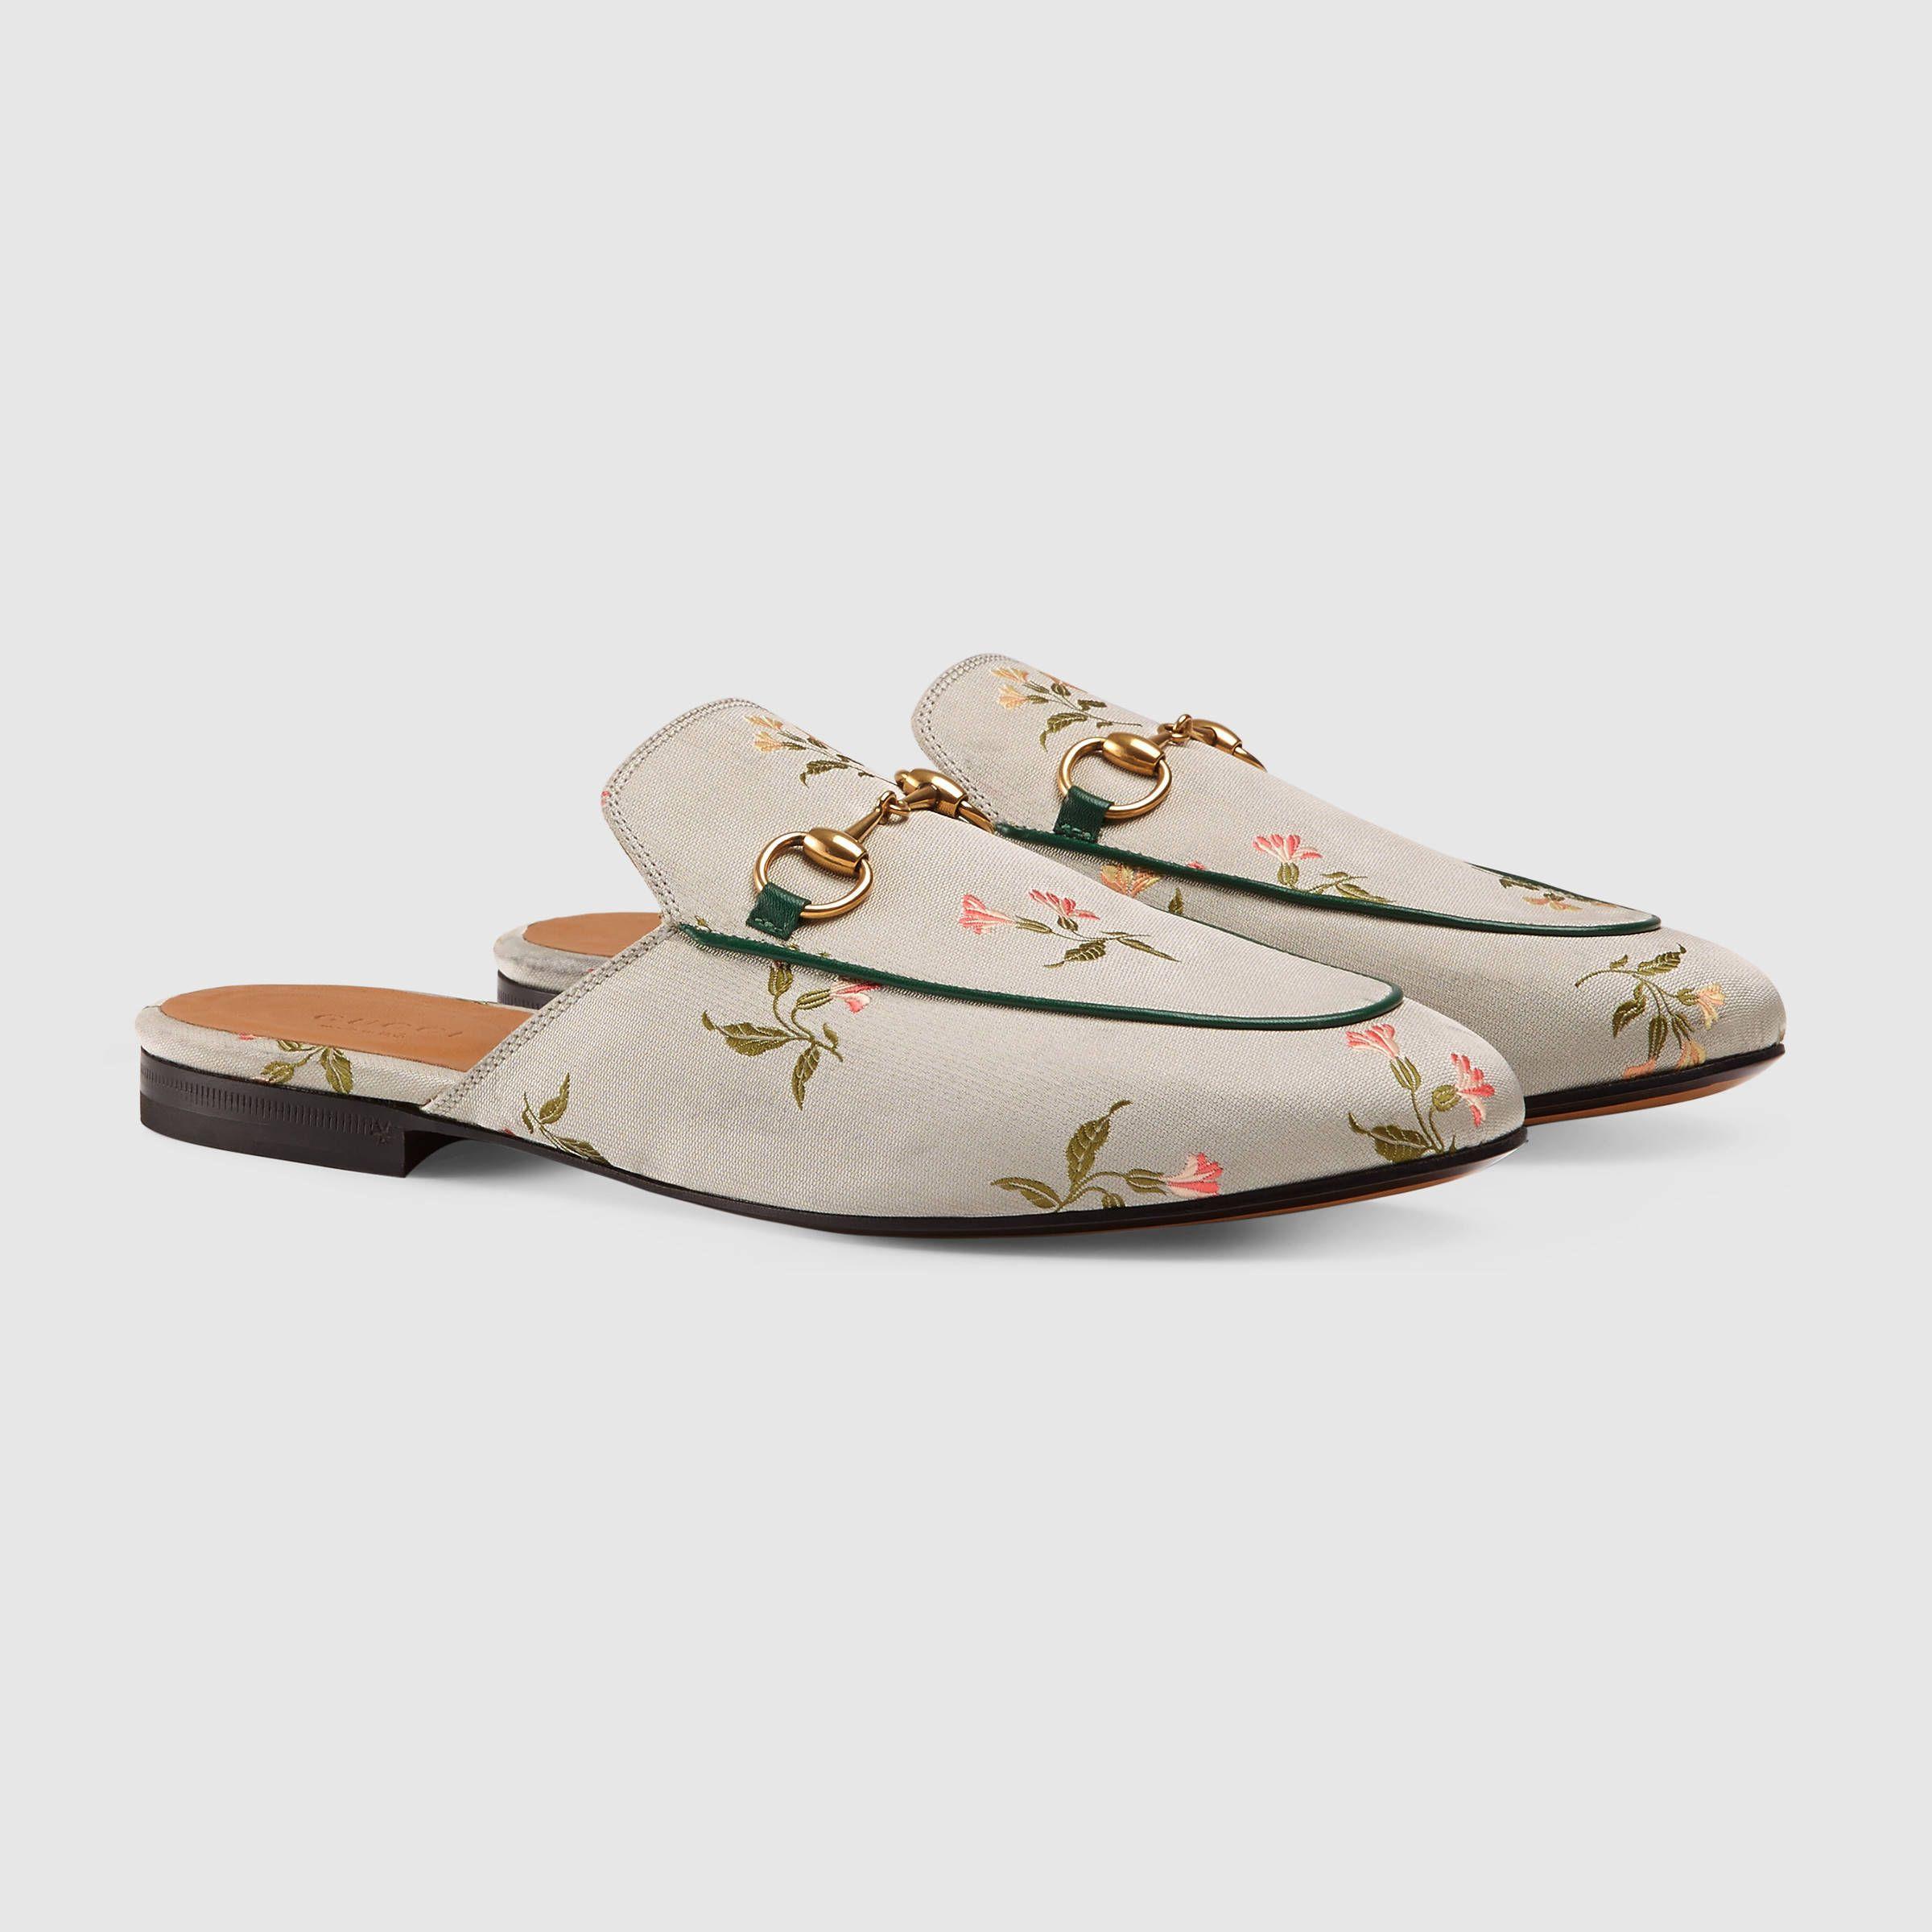 de1cfddaa Princetown floral duchesse slipper | ***GUCCI FASHION*** | Shoes ...